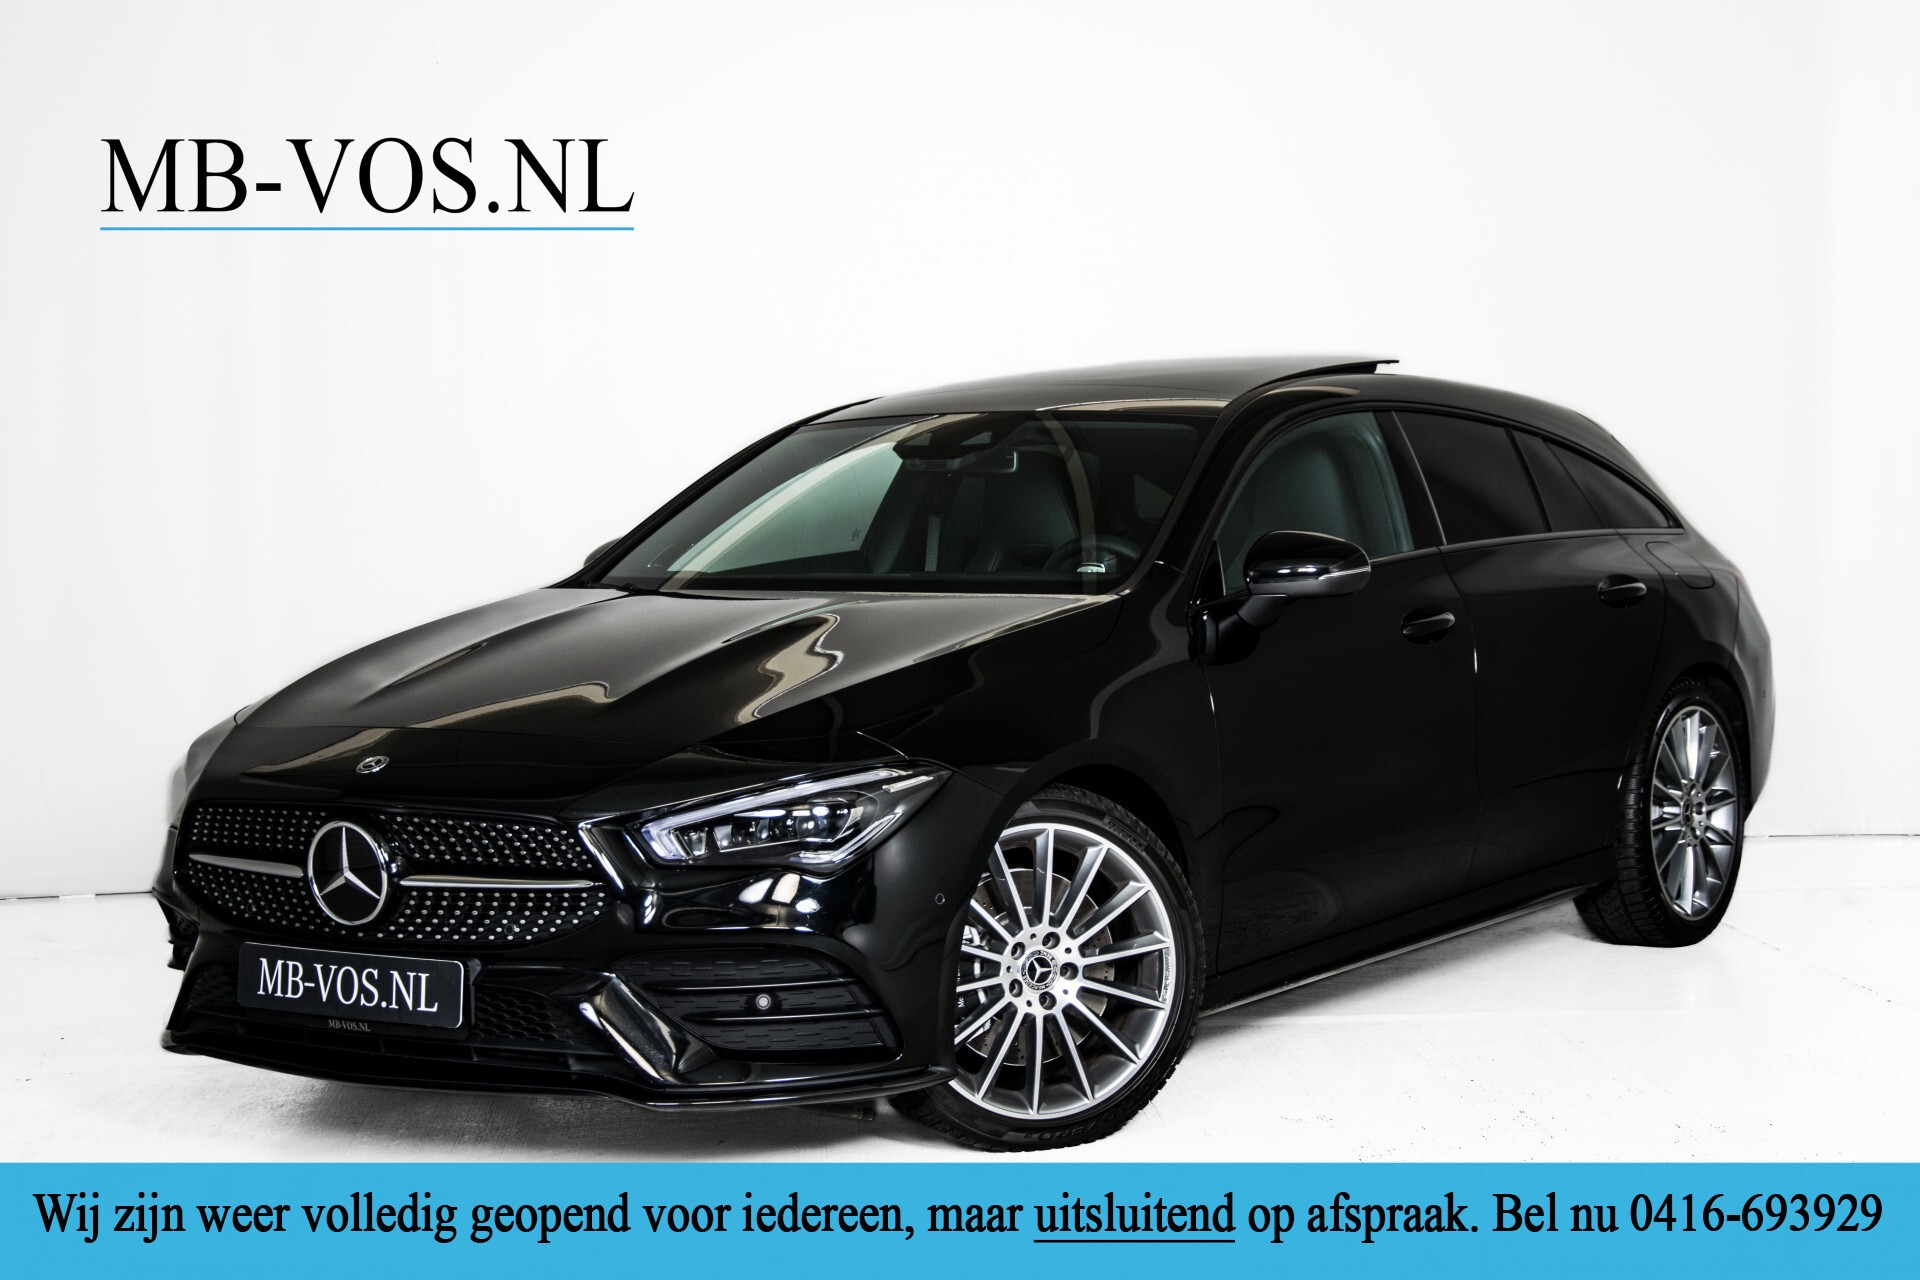 Mercedes-Benz CLA-Klasse Shooting Brake 250 AMG Panorama/Rij-assistentie/Burmester/Night Aut7 Foto 1